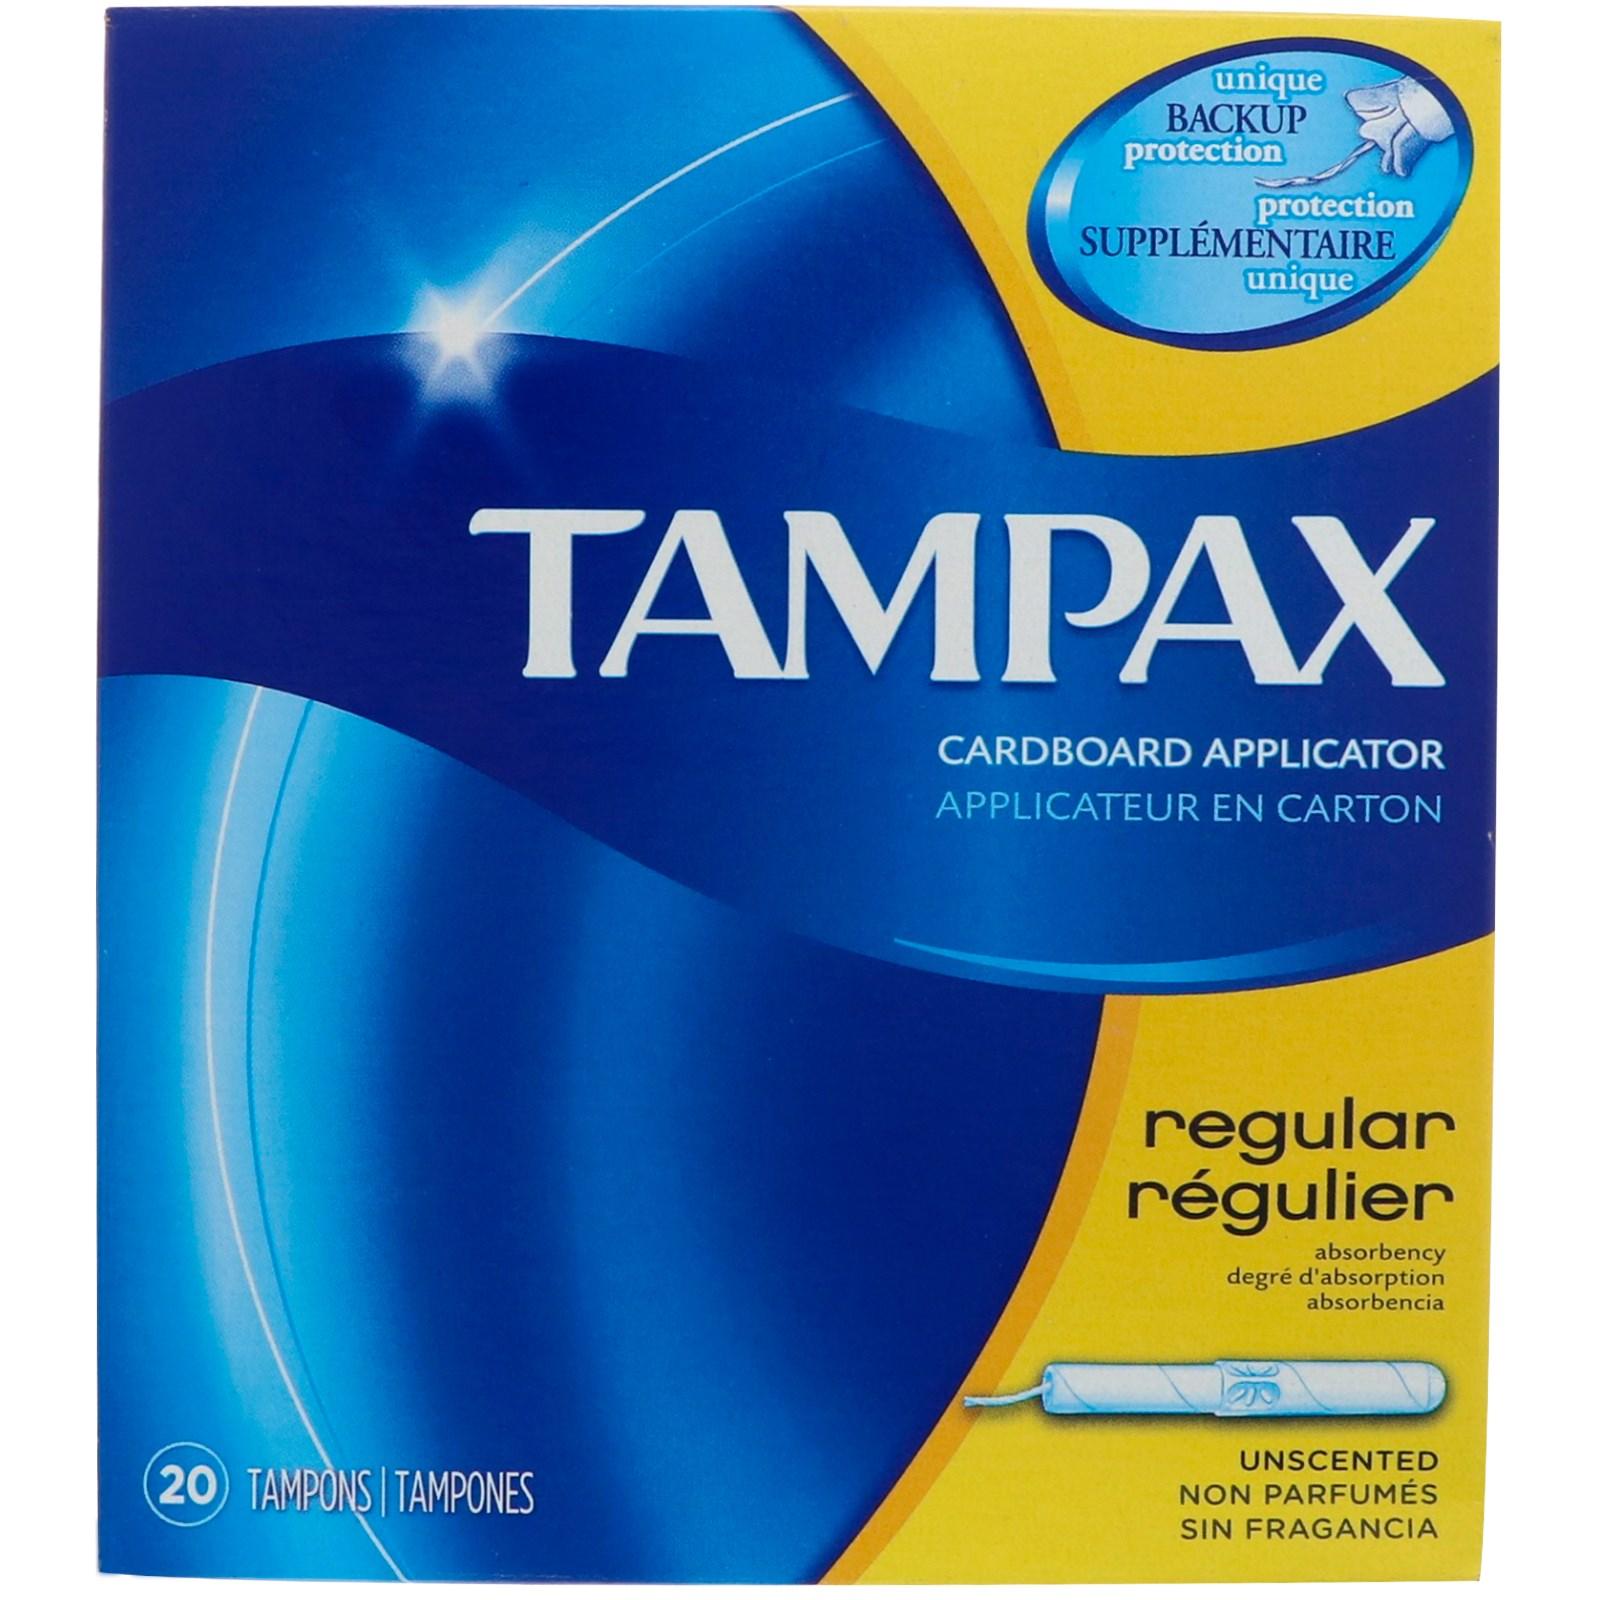 Tampax, Cardboard, Regular, Unscented, 20 Tampons